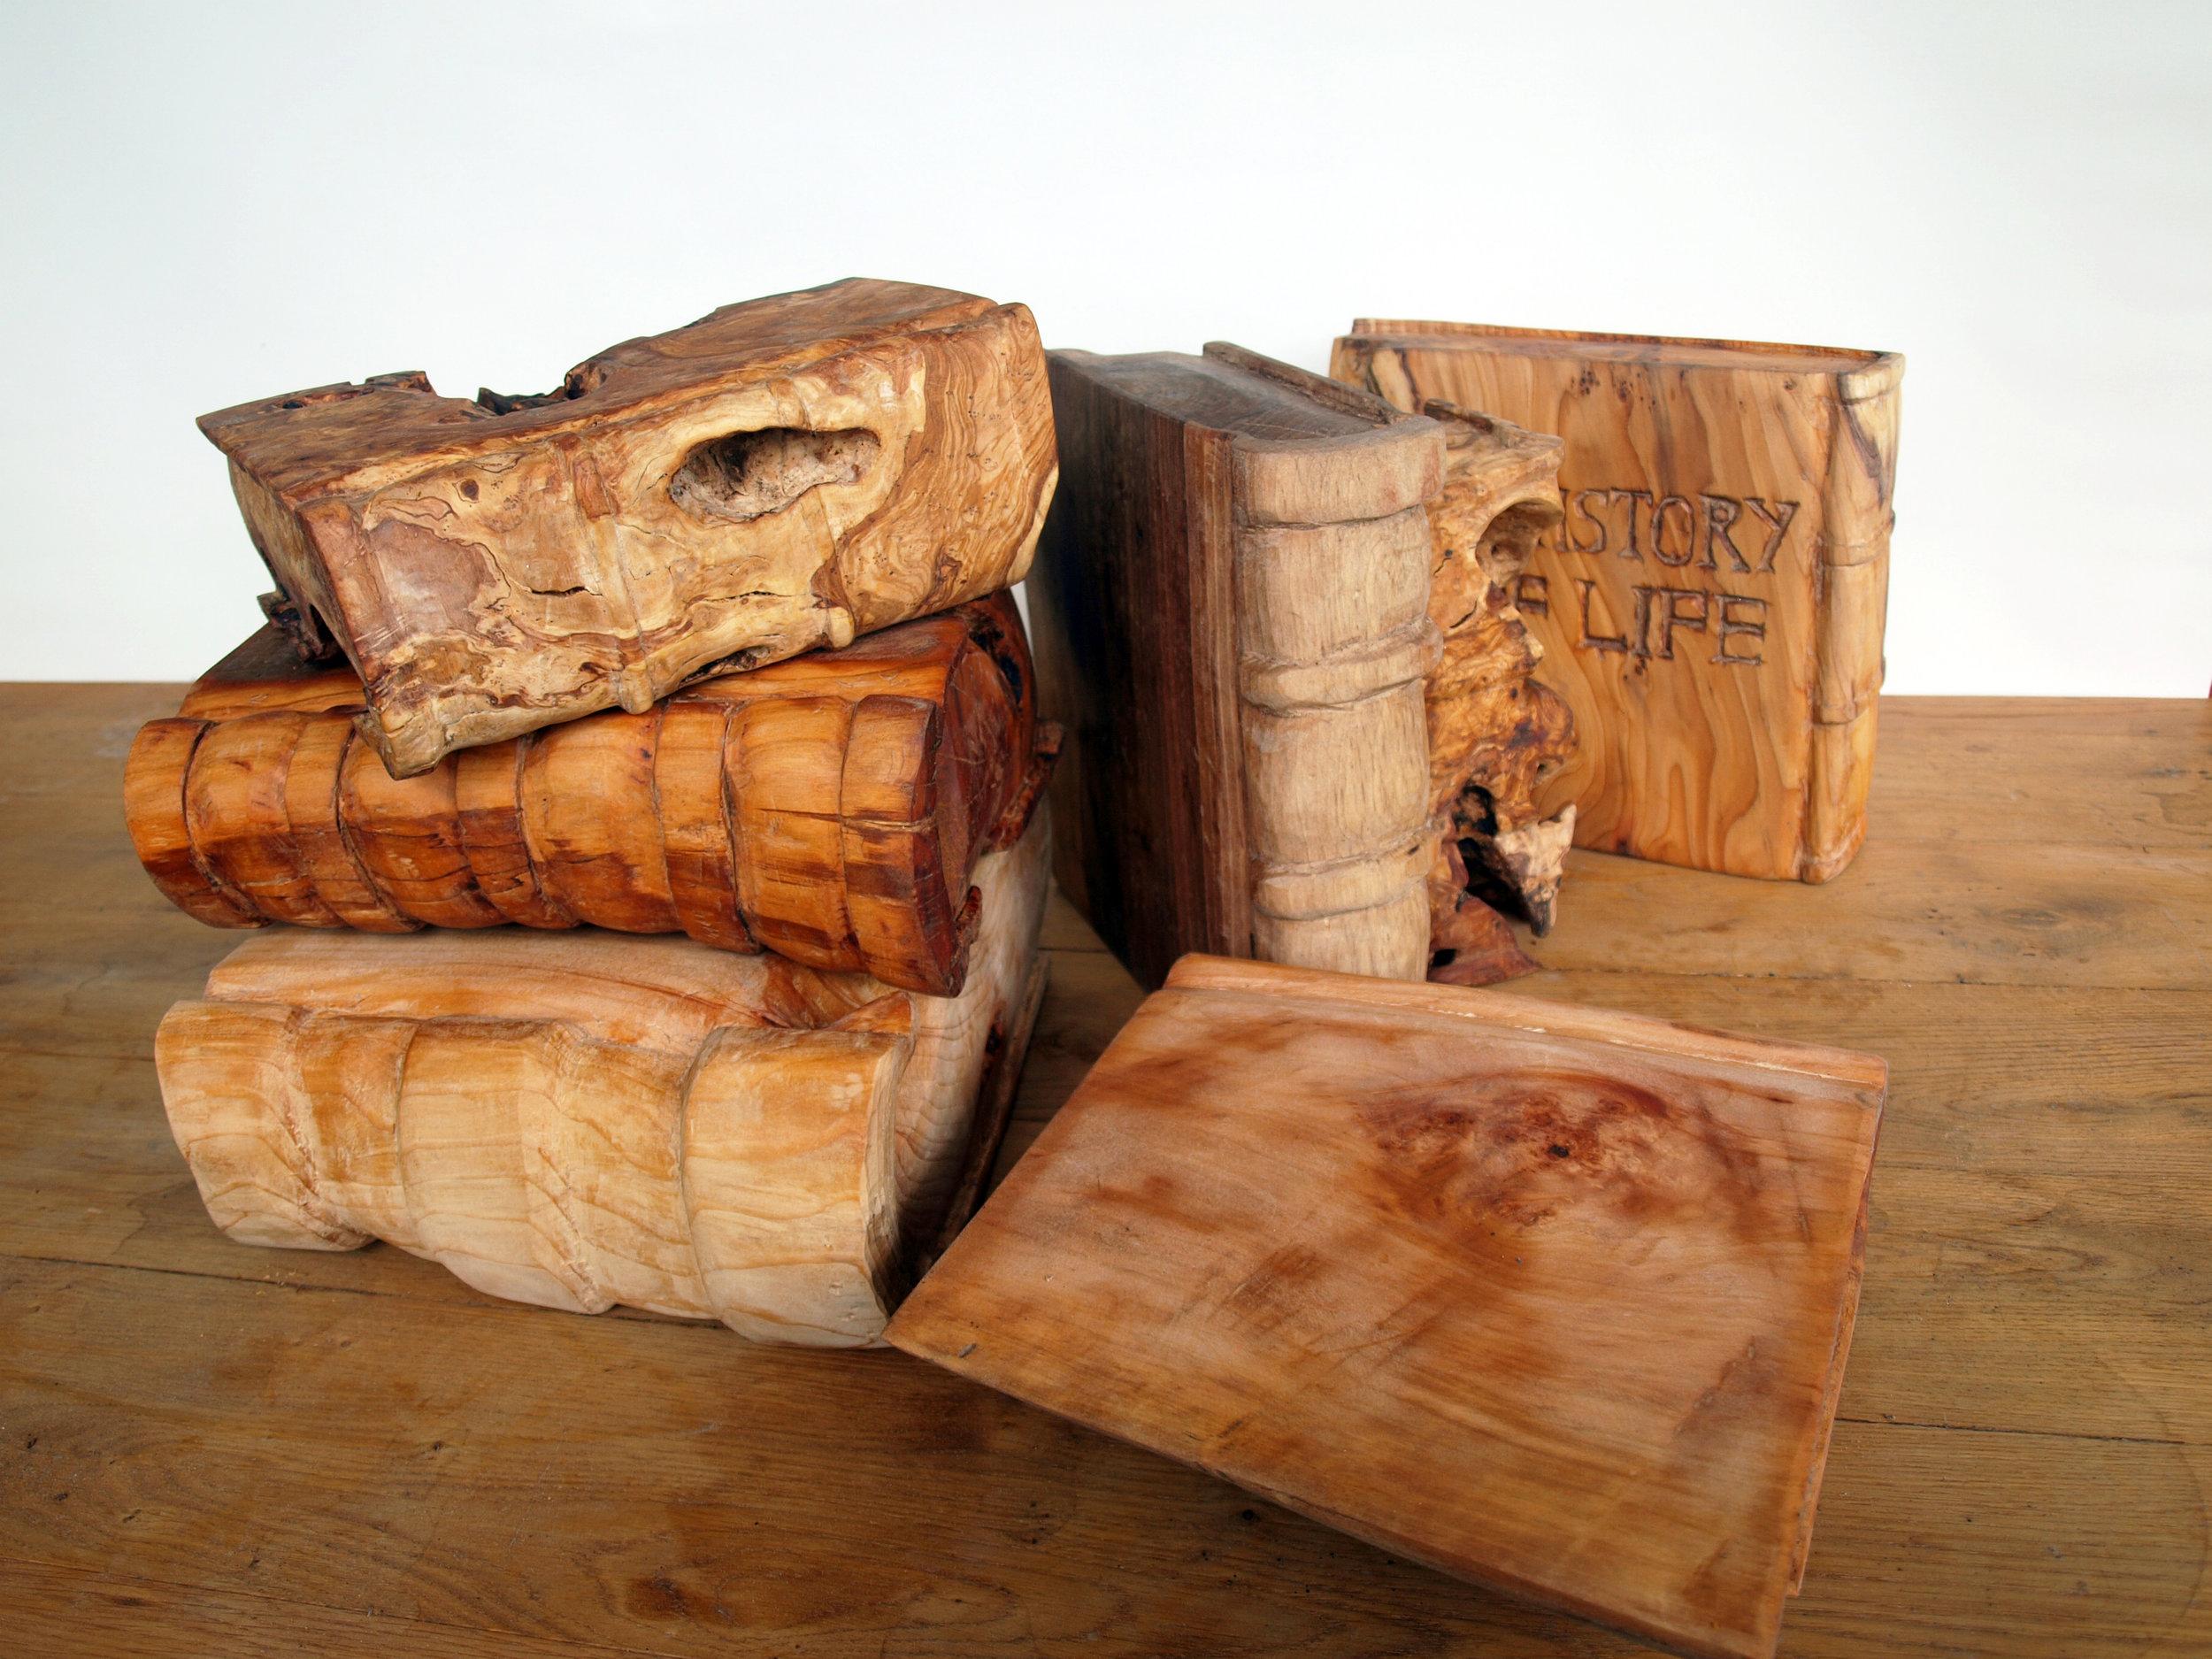 A history of life 2012 wood (17).JPG